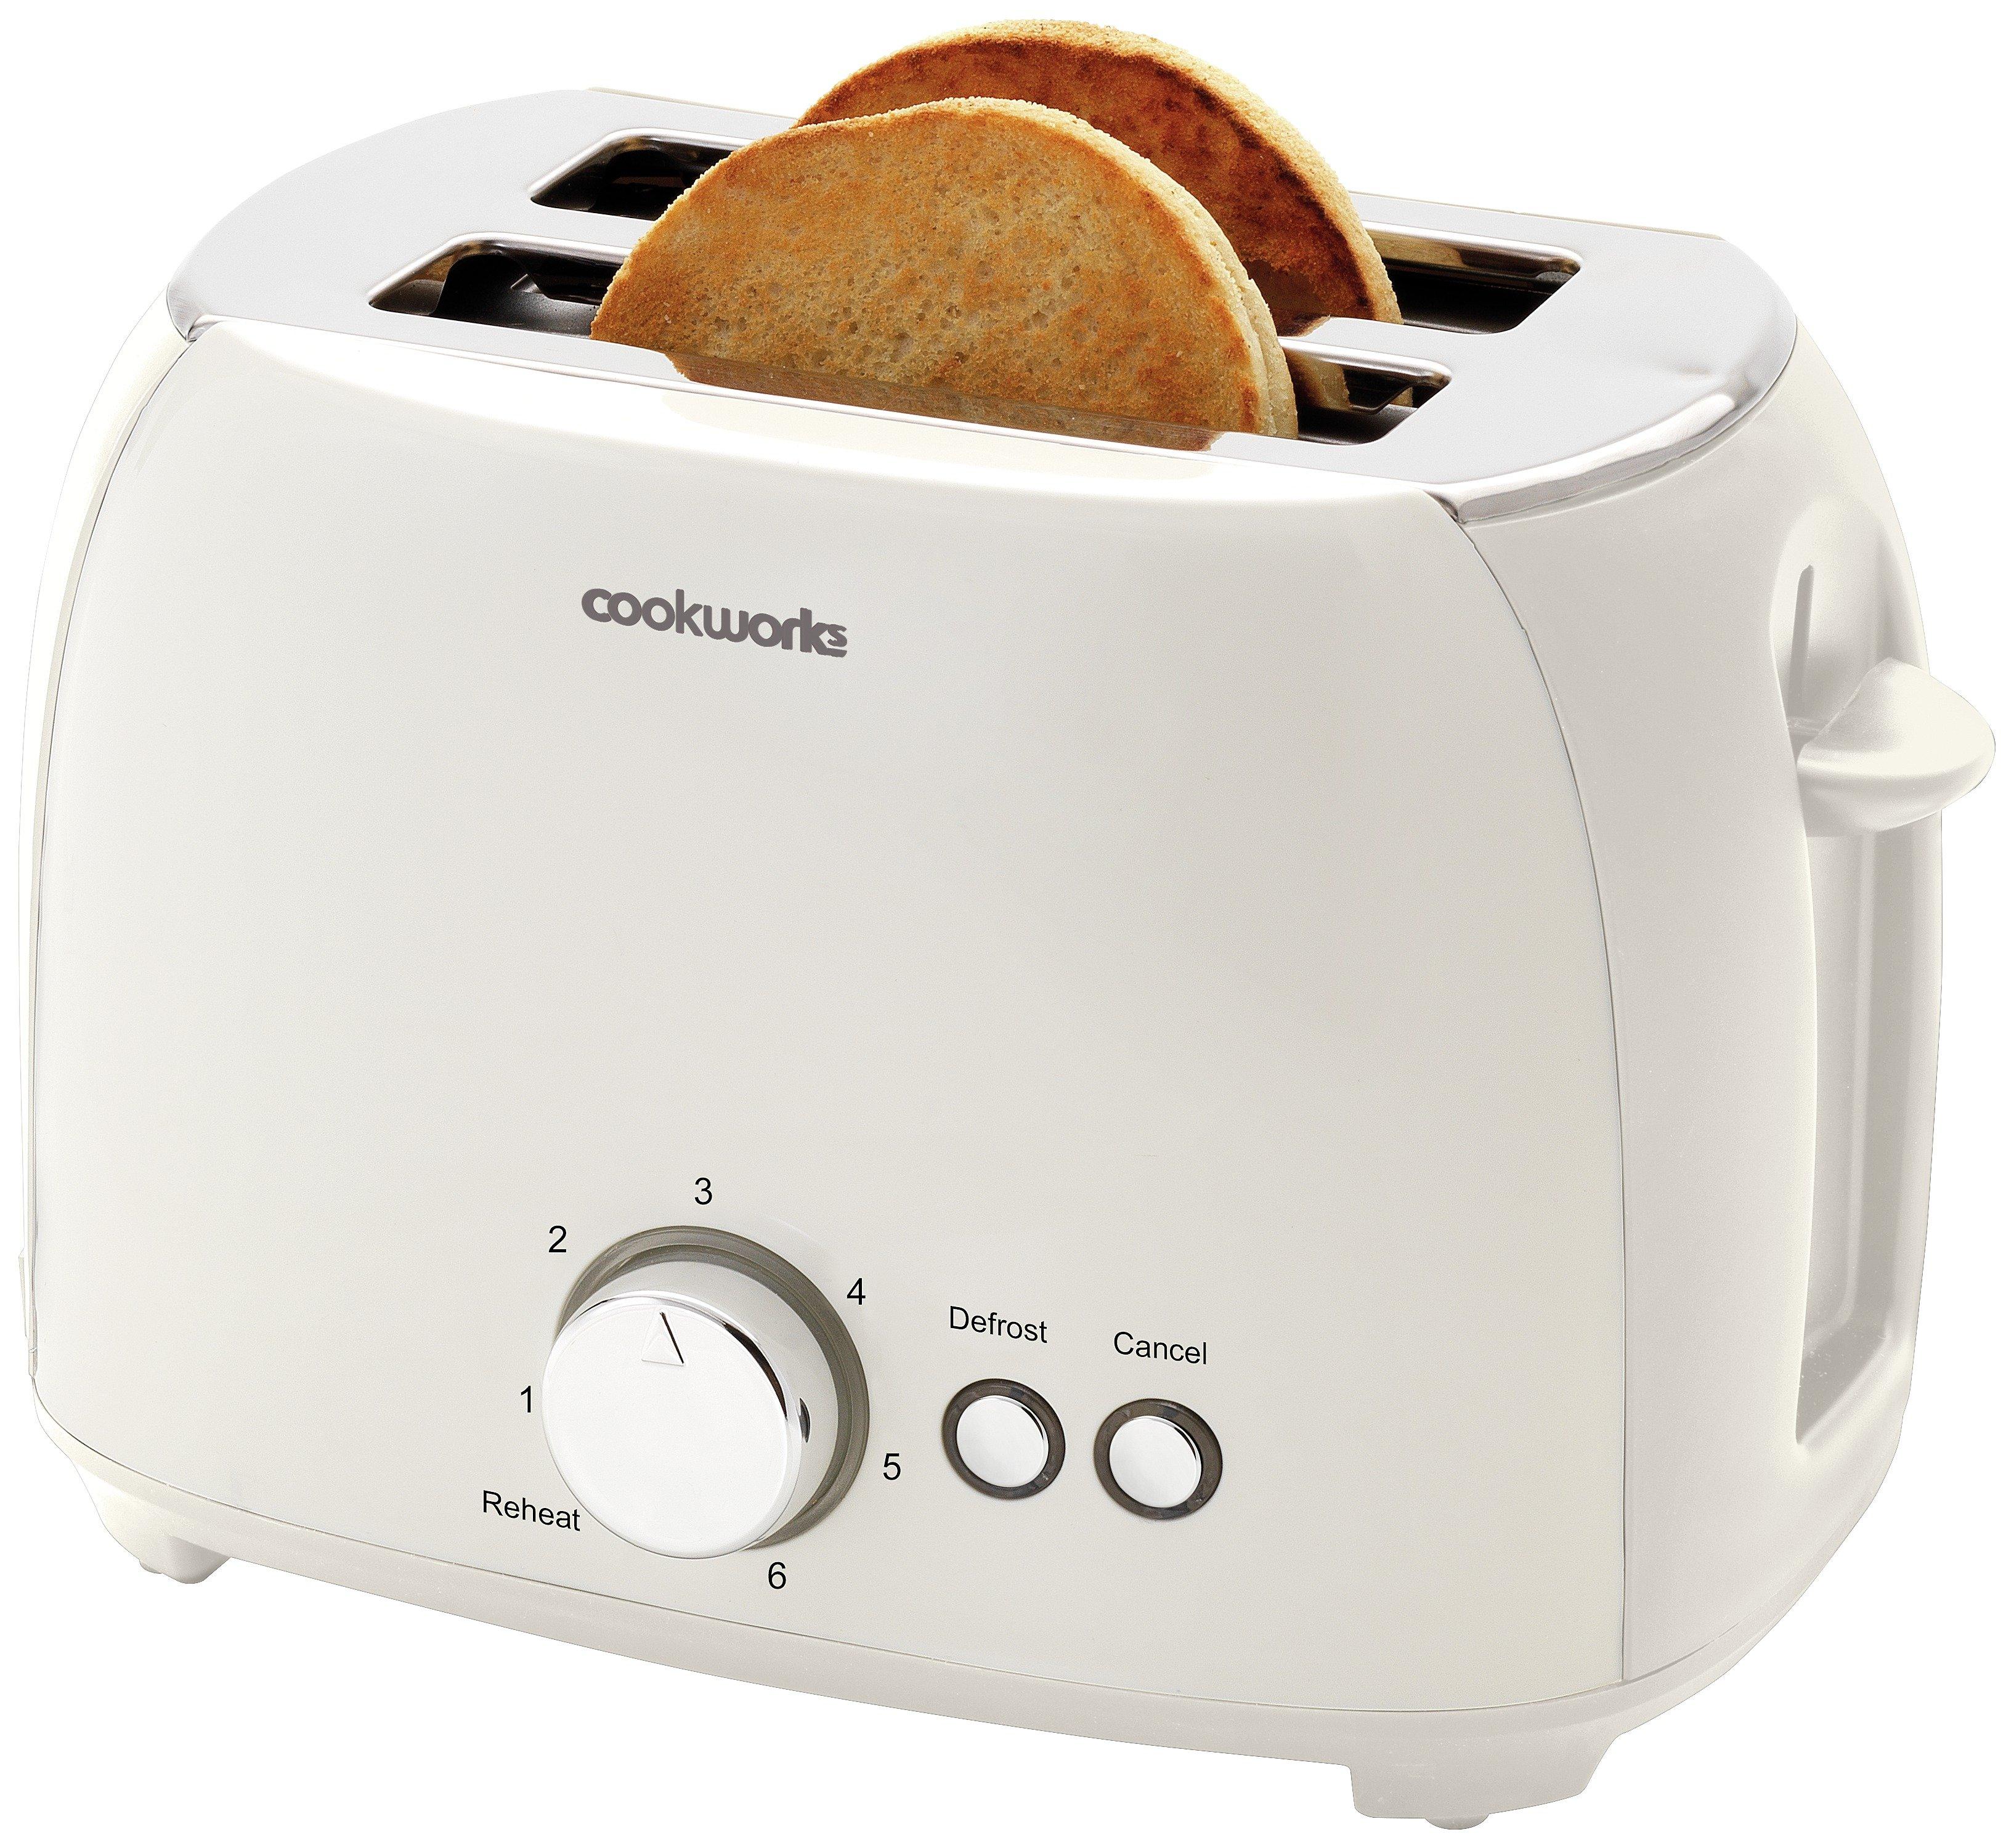 'Cookworks 2 Slice Toaster 800 Watts - White